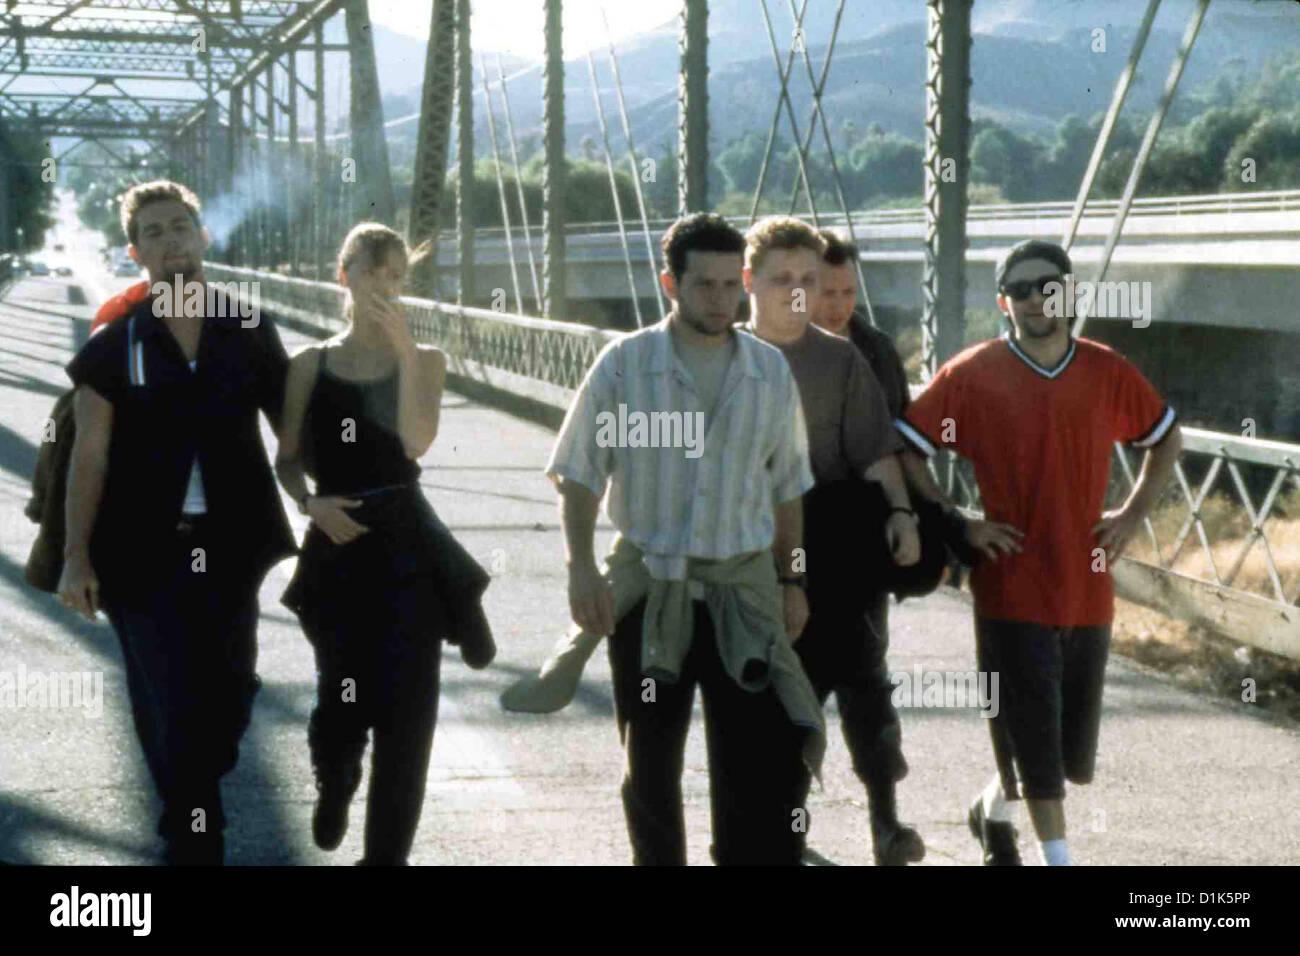 Nato male nato male Craig (Francesco Ryan, Laura (Heidi Noelle Lenhart), Brian (Justin Walker), Evan (Patrick Renna)?, Immagini Stock